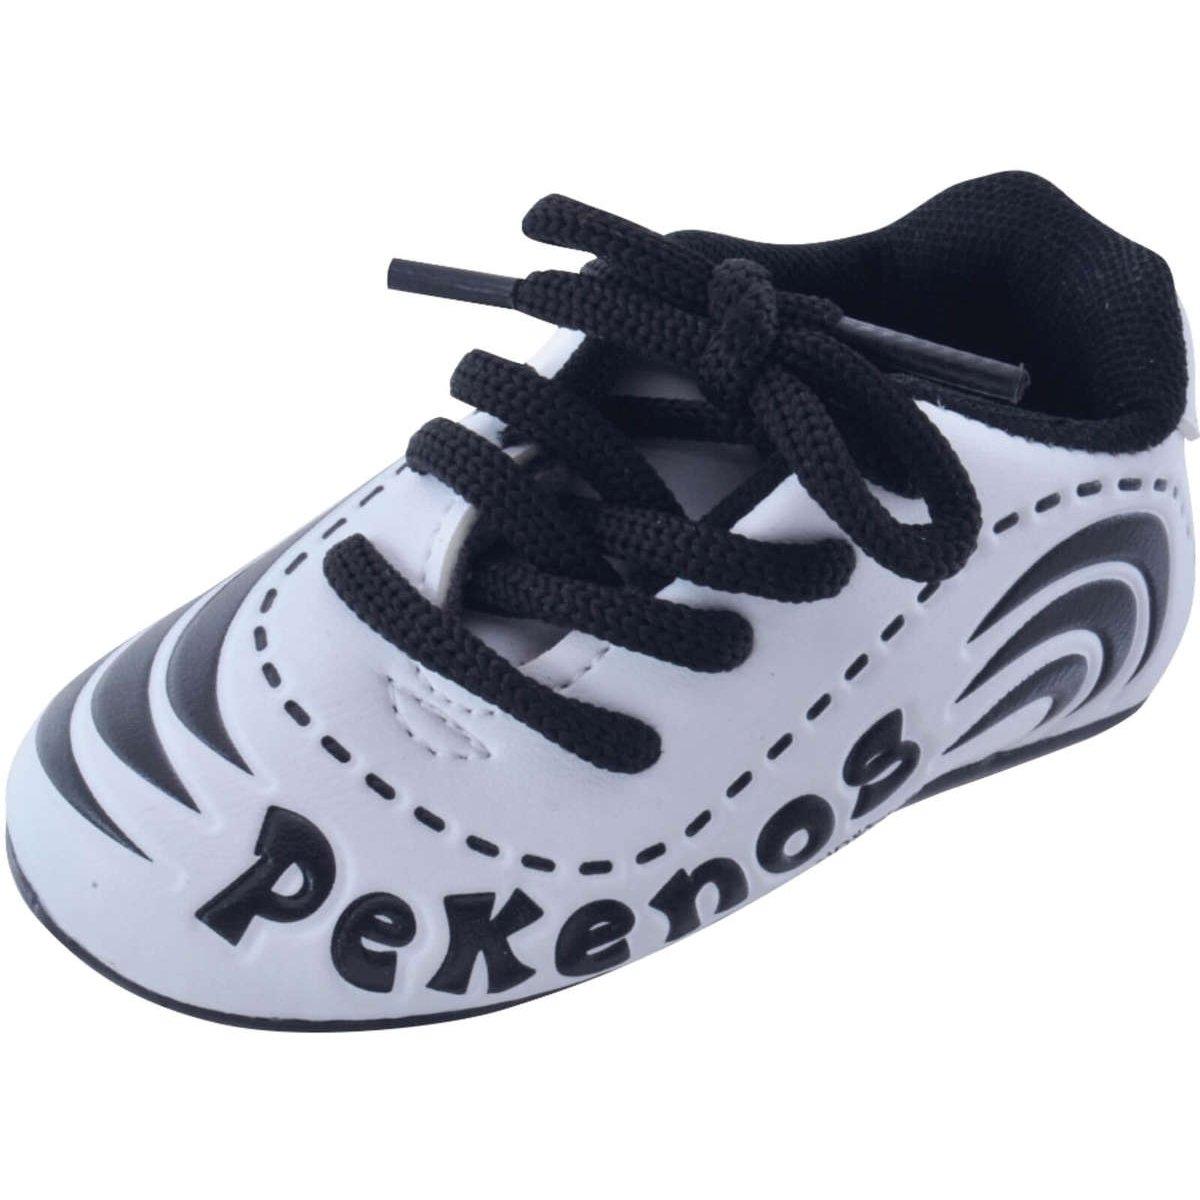 Chuteira Infantil Pekenos Mimos 610 - Compre Agora   Netshoes e6a70007cc